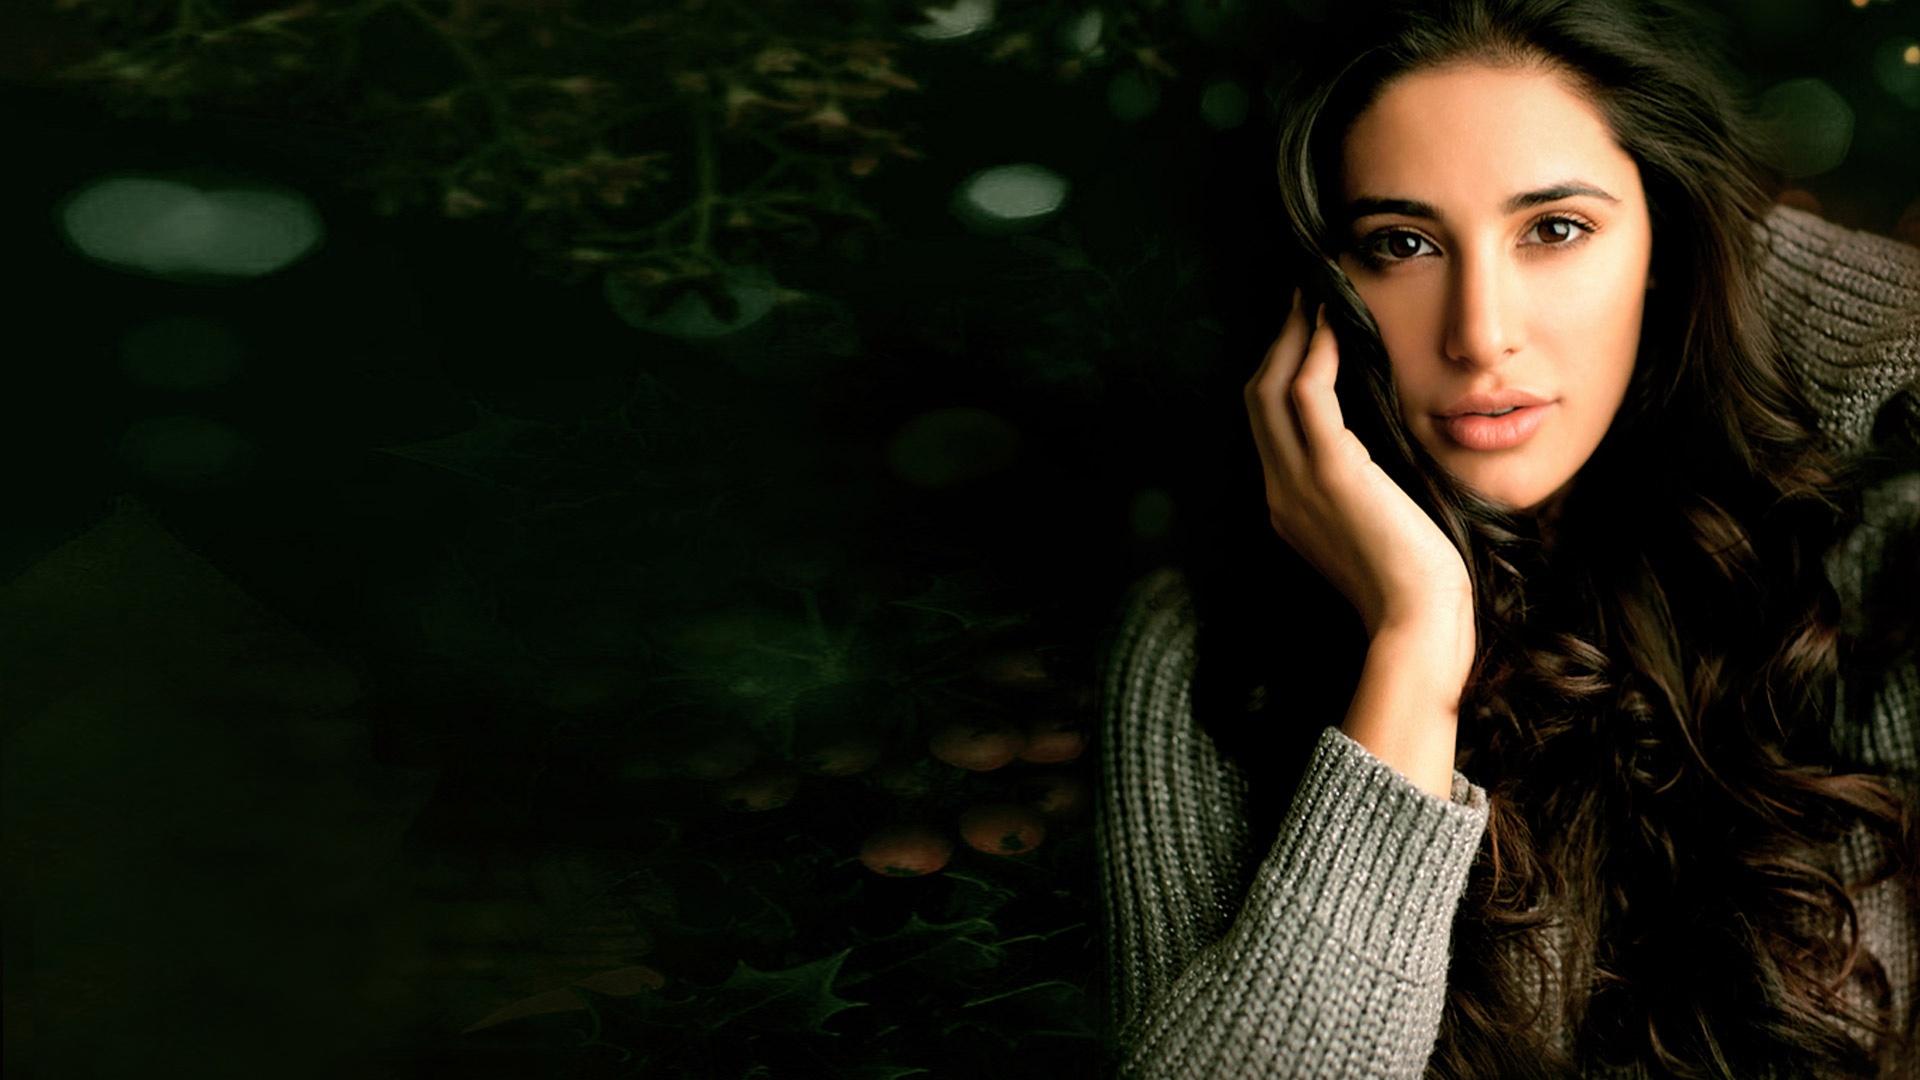 Nargis fakhri hd wallpaper background image 1920x1080 id 562450 wallpaper abyss - Indian beautiful models hd wallpapers ...